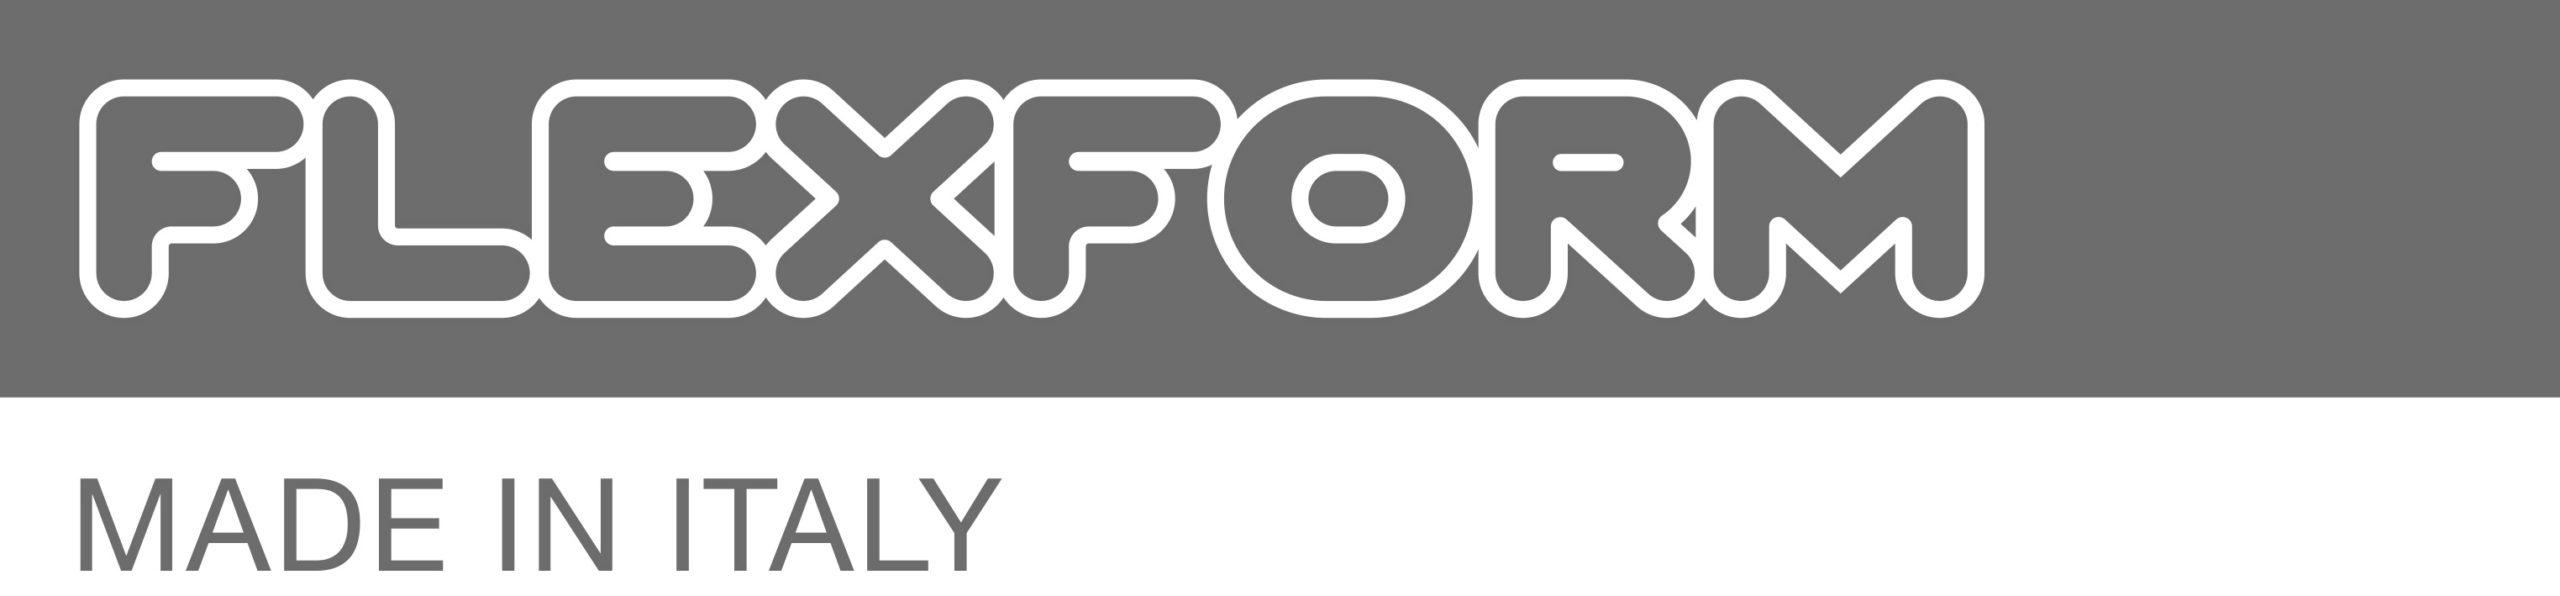 flexform logo neu